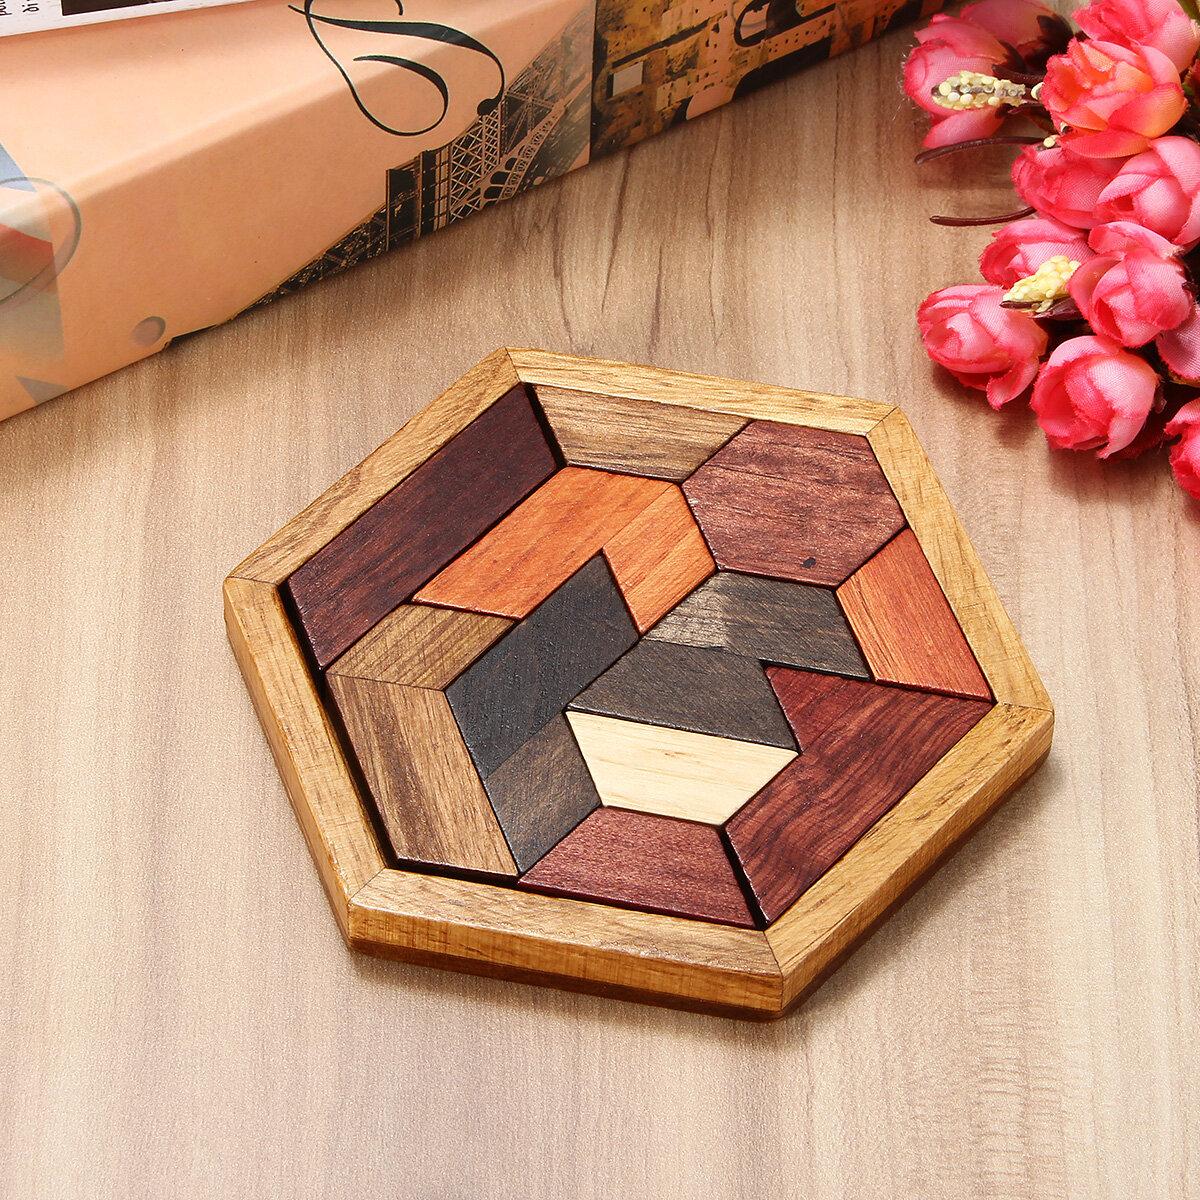 DIY 9PCS Wooden IQ Game Jigsaw Intelligent Tangram Brain Teaser Puzzle Kids Toys - 1